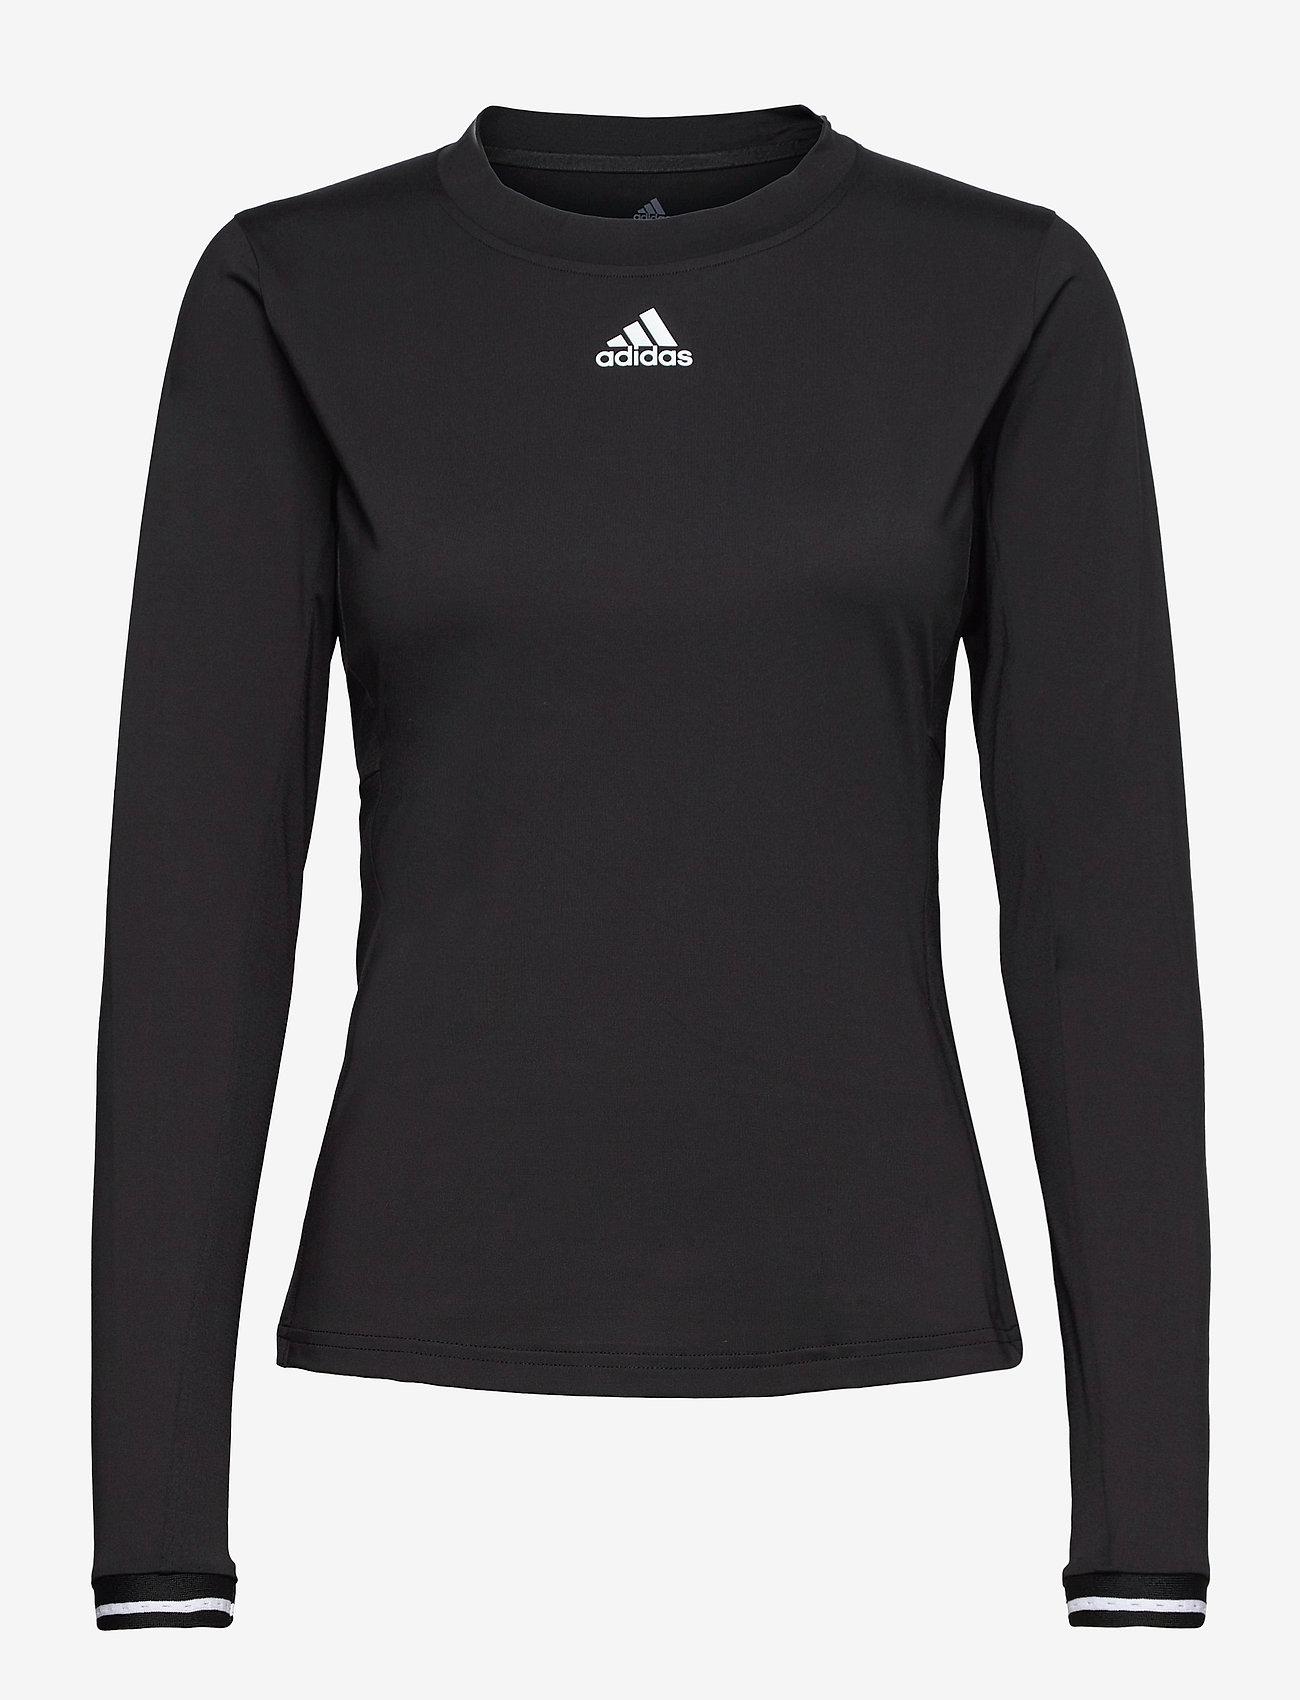 adidas Performance - Tennis Freelift Long Sleeve Tee - black - 1